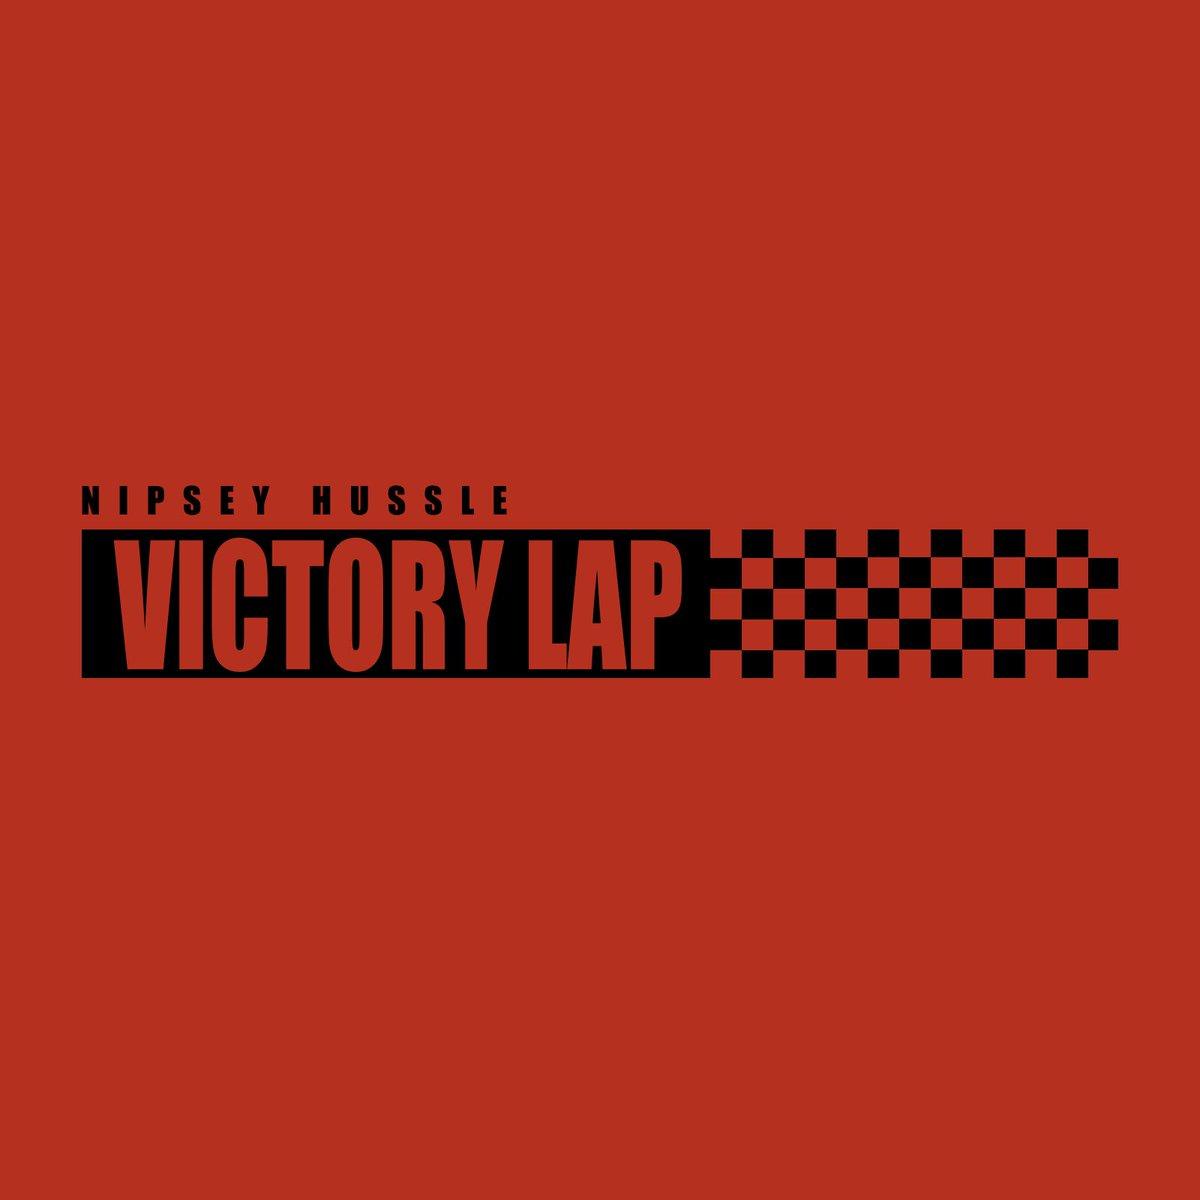 Thelemonlor Nipsey Hussles Victory Lap - BerkshireRegion